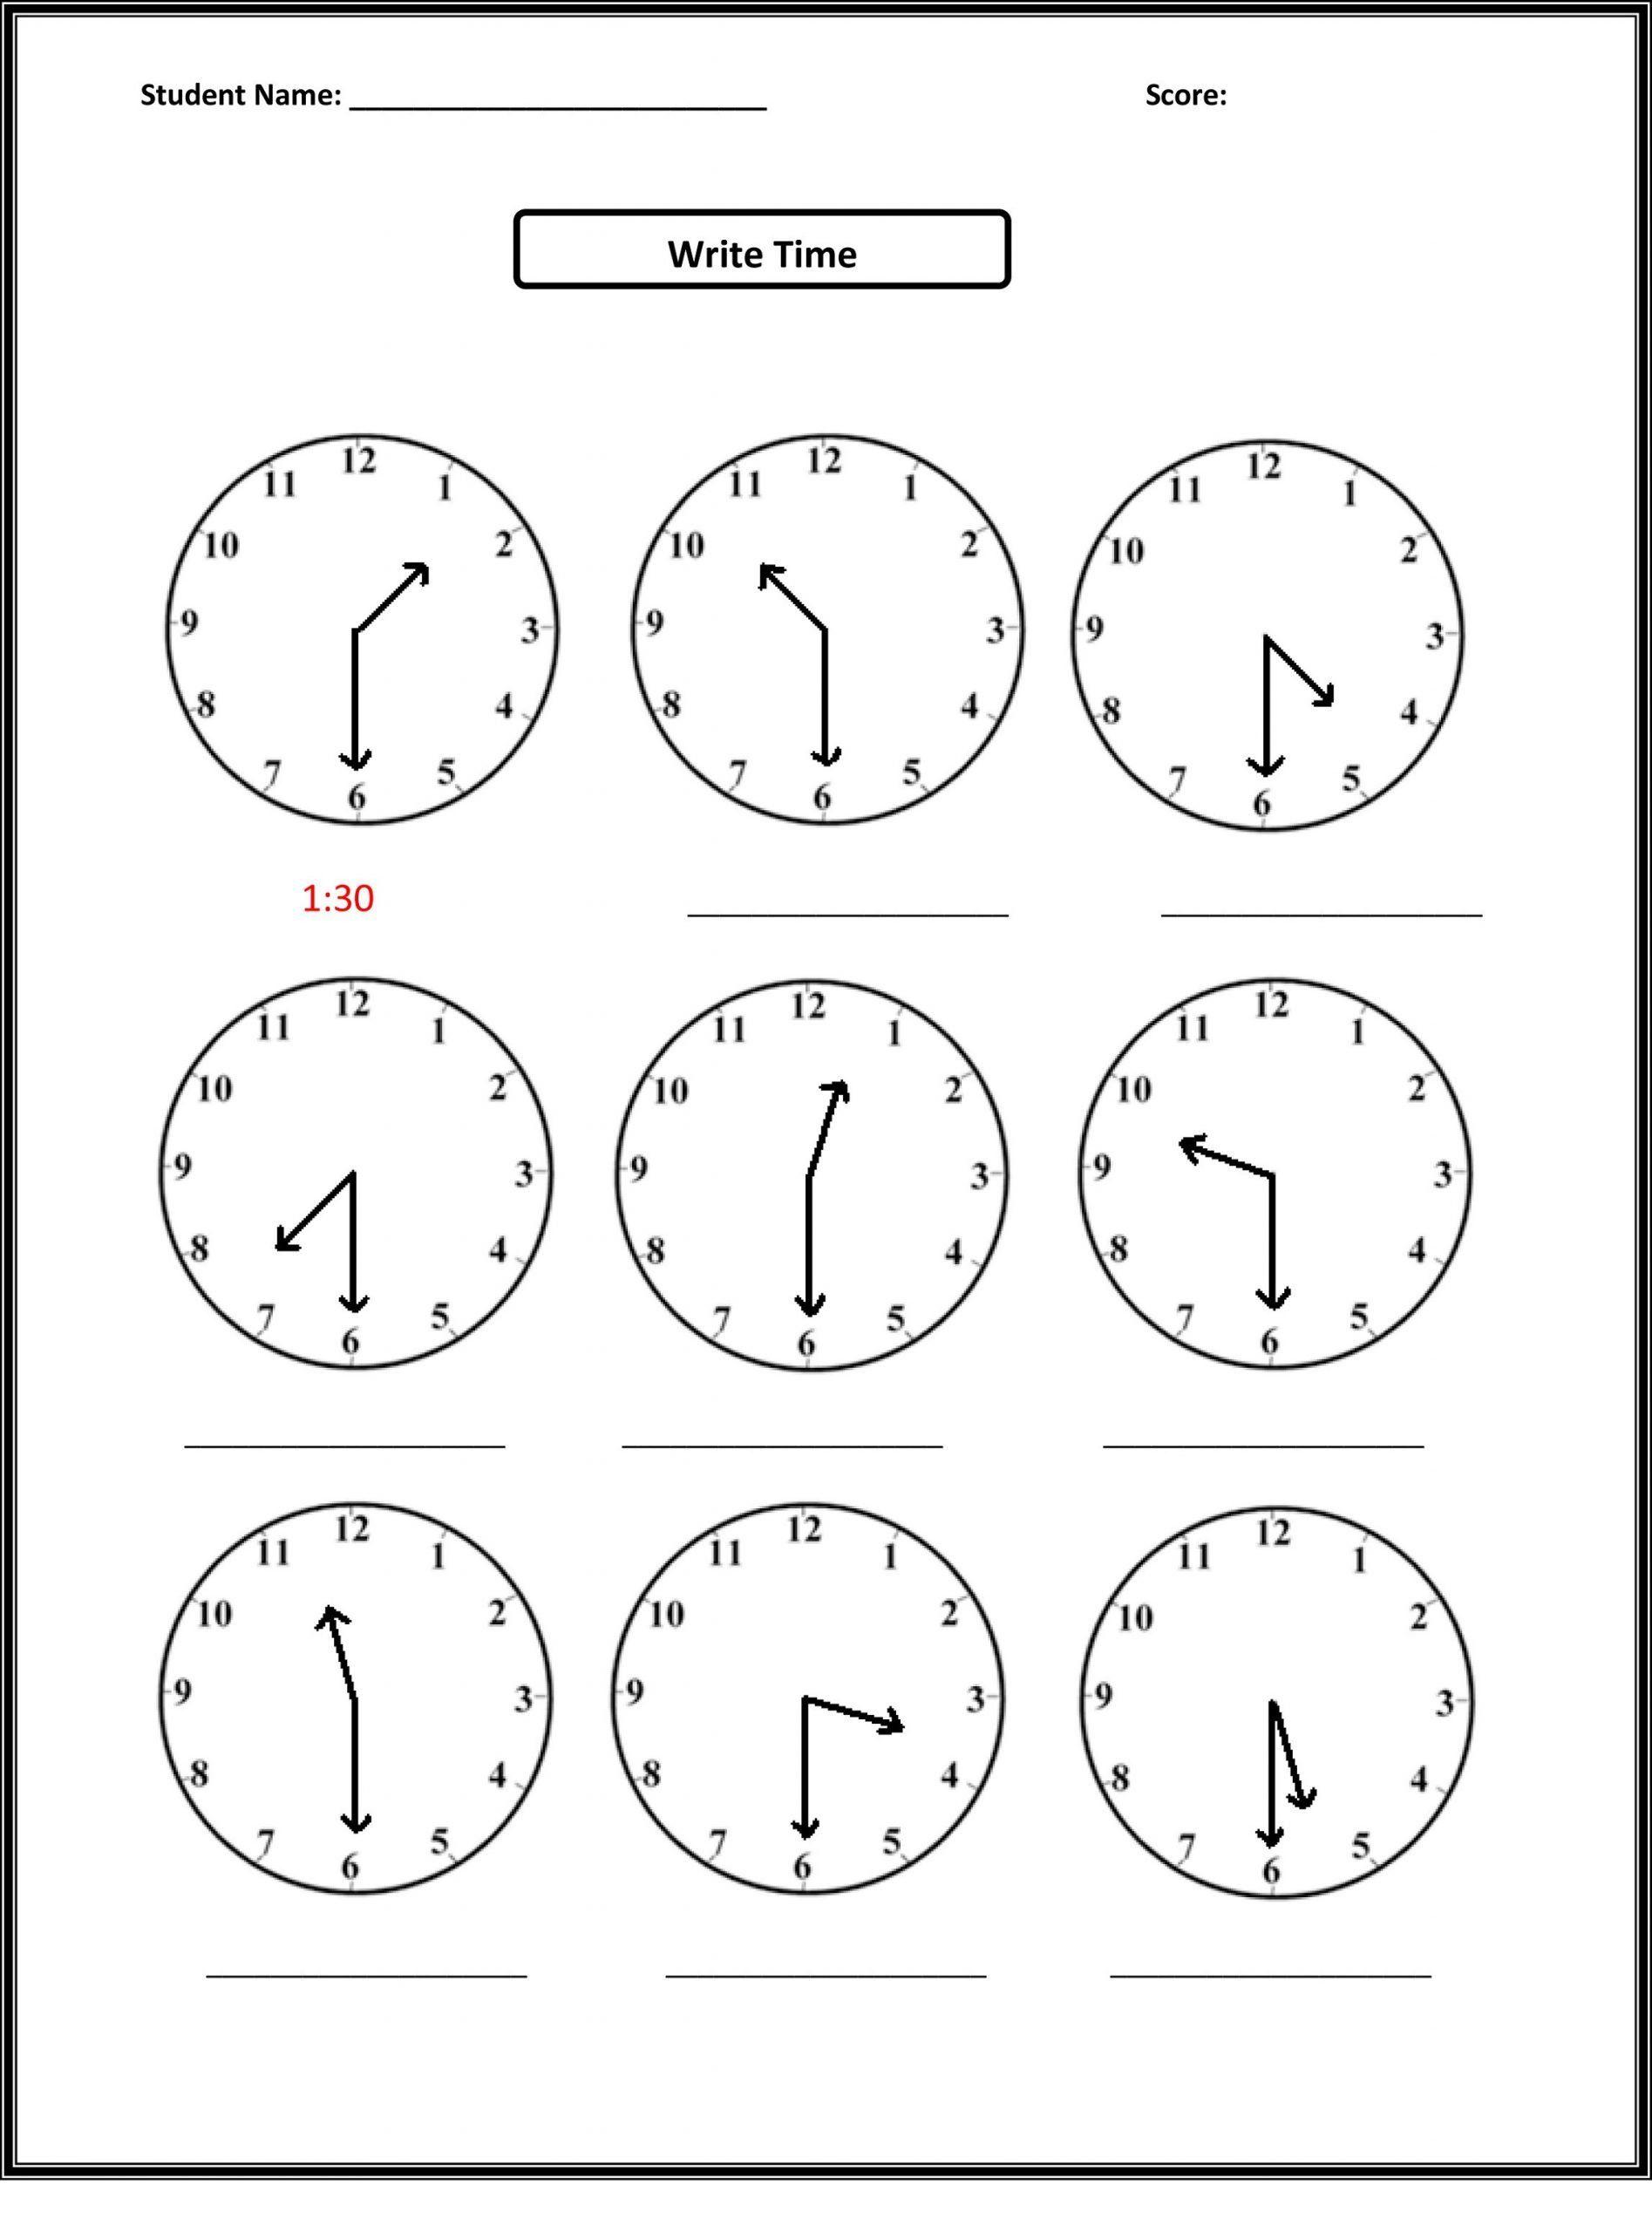 Elapsed Time Worksheets 3rd Grade Elapsed Time Worksheets 2nd Grade Lines In 2020 Third Grade Math Worksheets First Grade Math Worksheets Free Math Worksheets